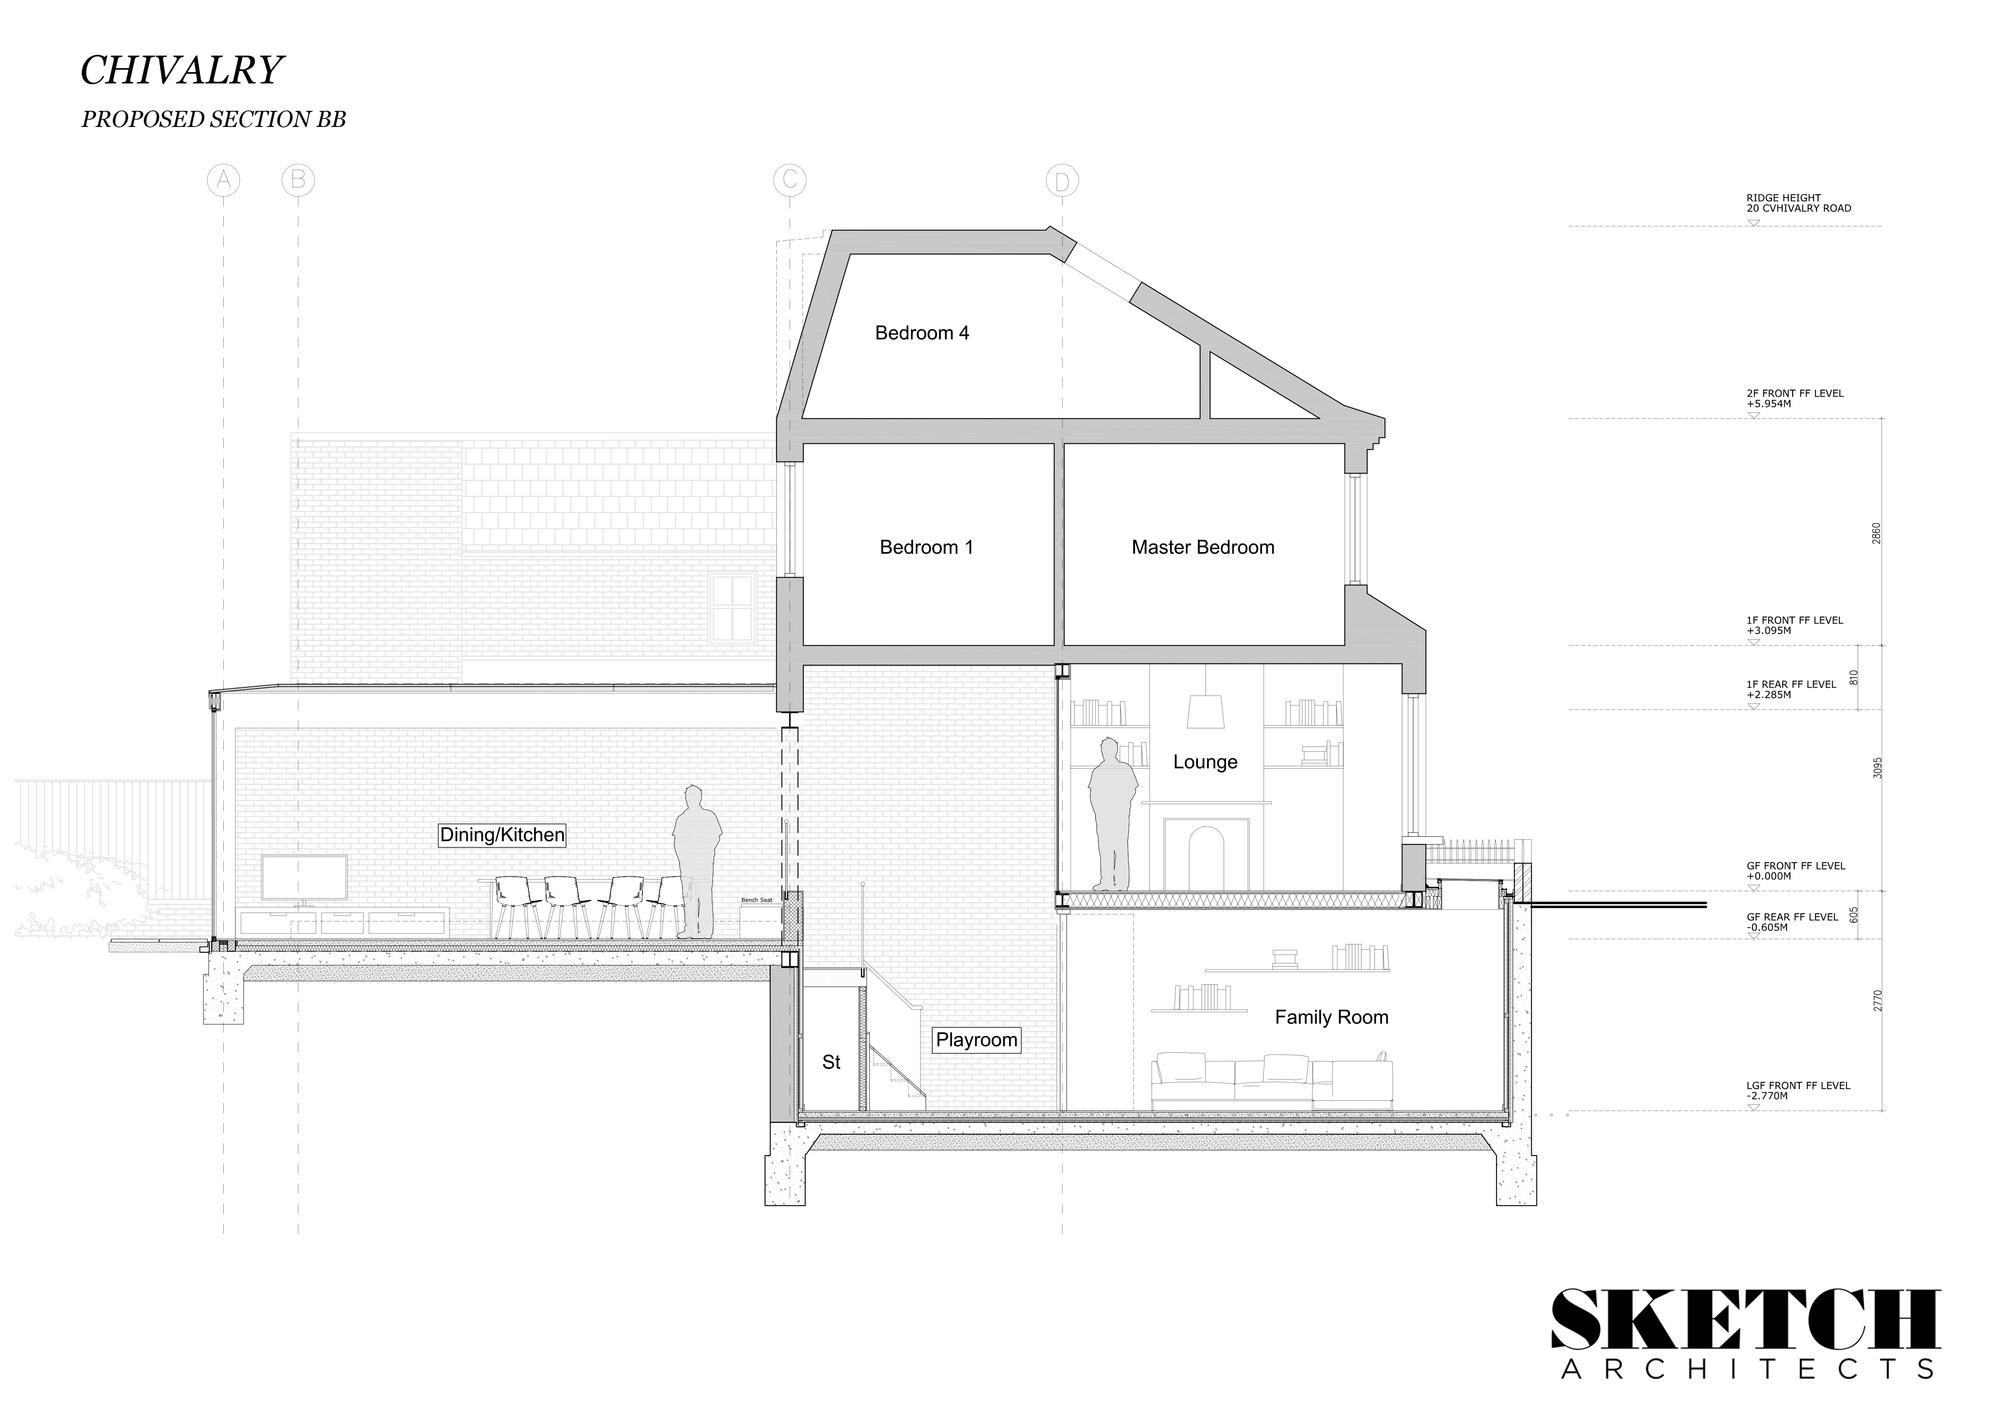 Galeria De Residencia Na Chivalry Road Sketch Architects 19